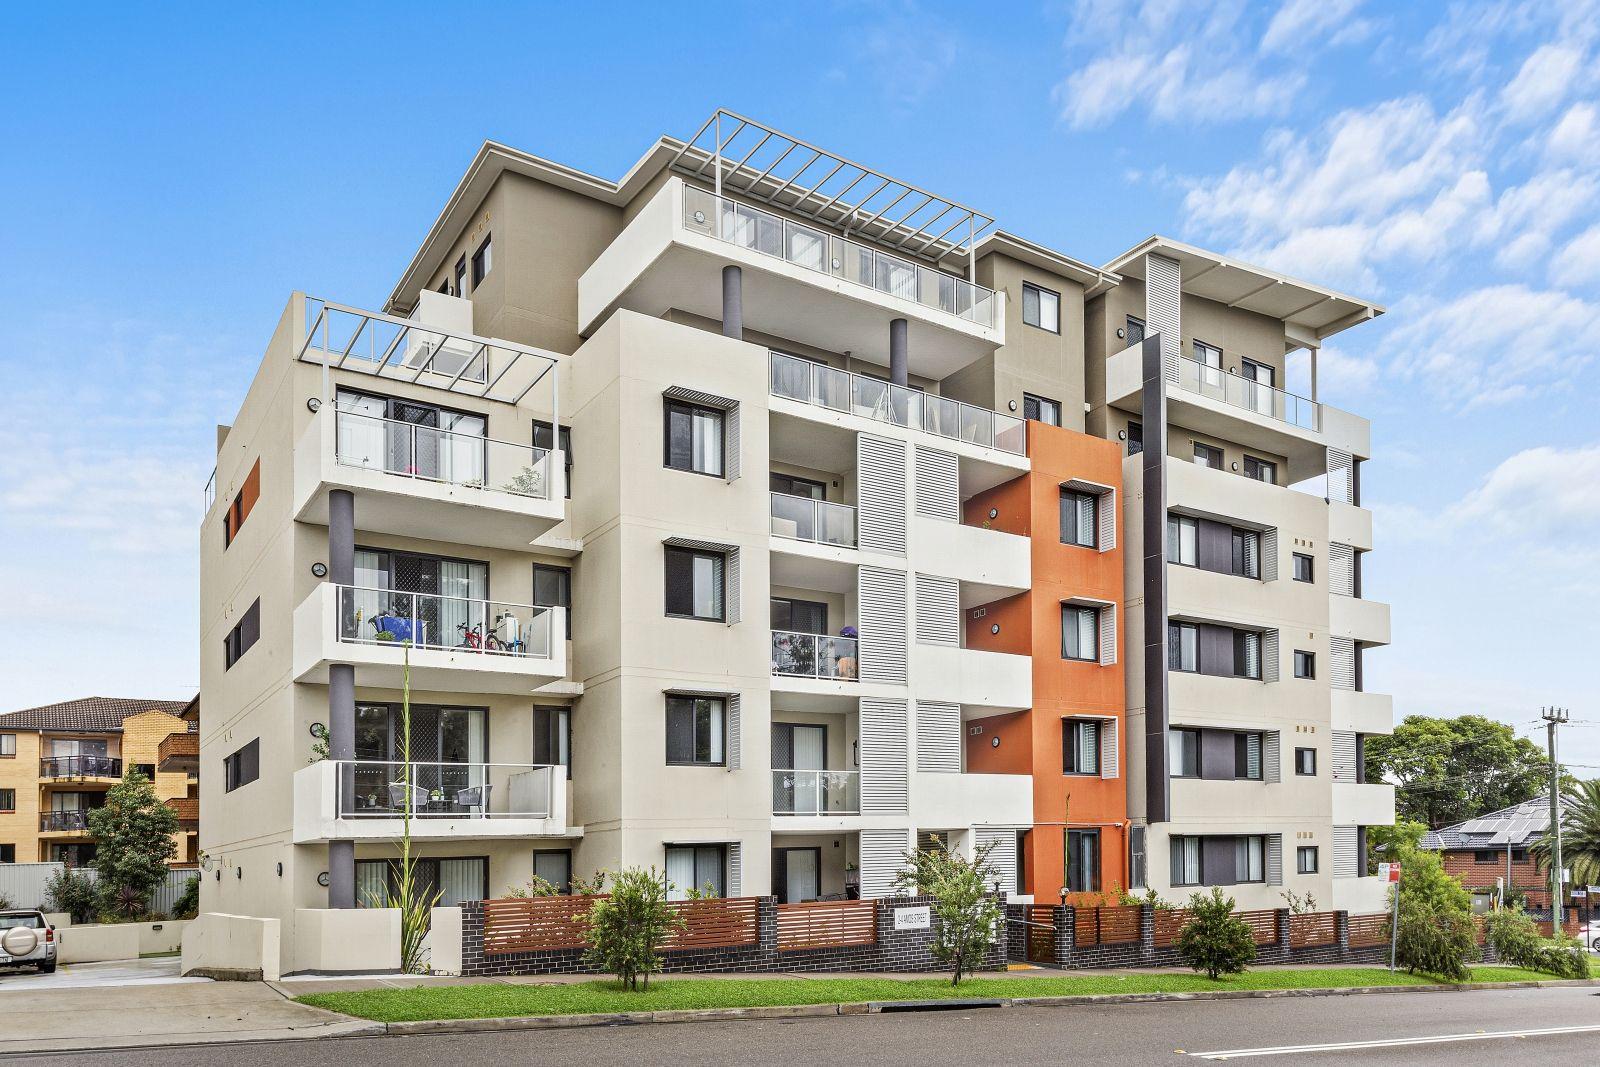 303/2-4 Amos St, Parramatta NSW 2150, Image 0